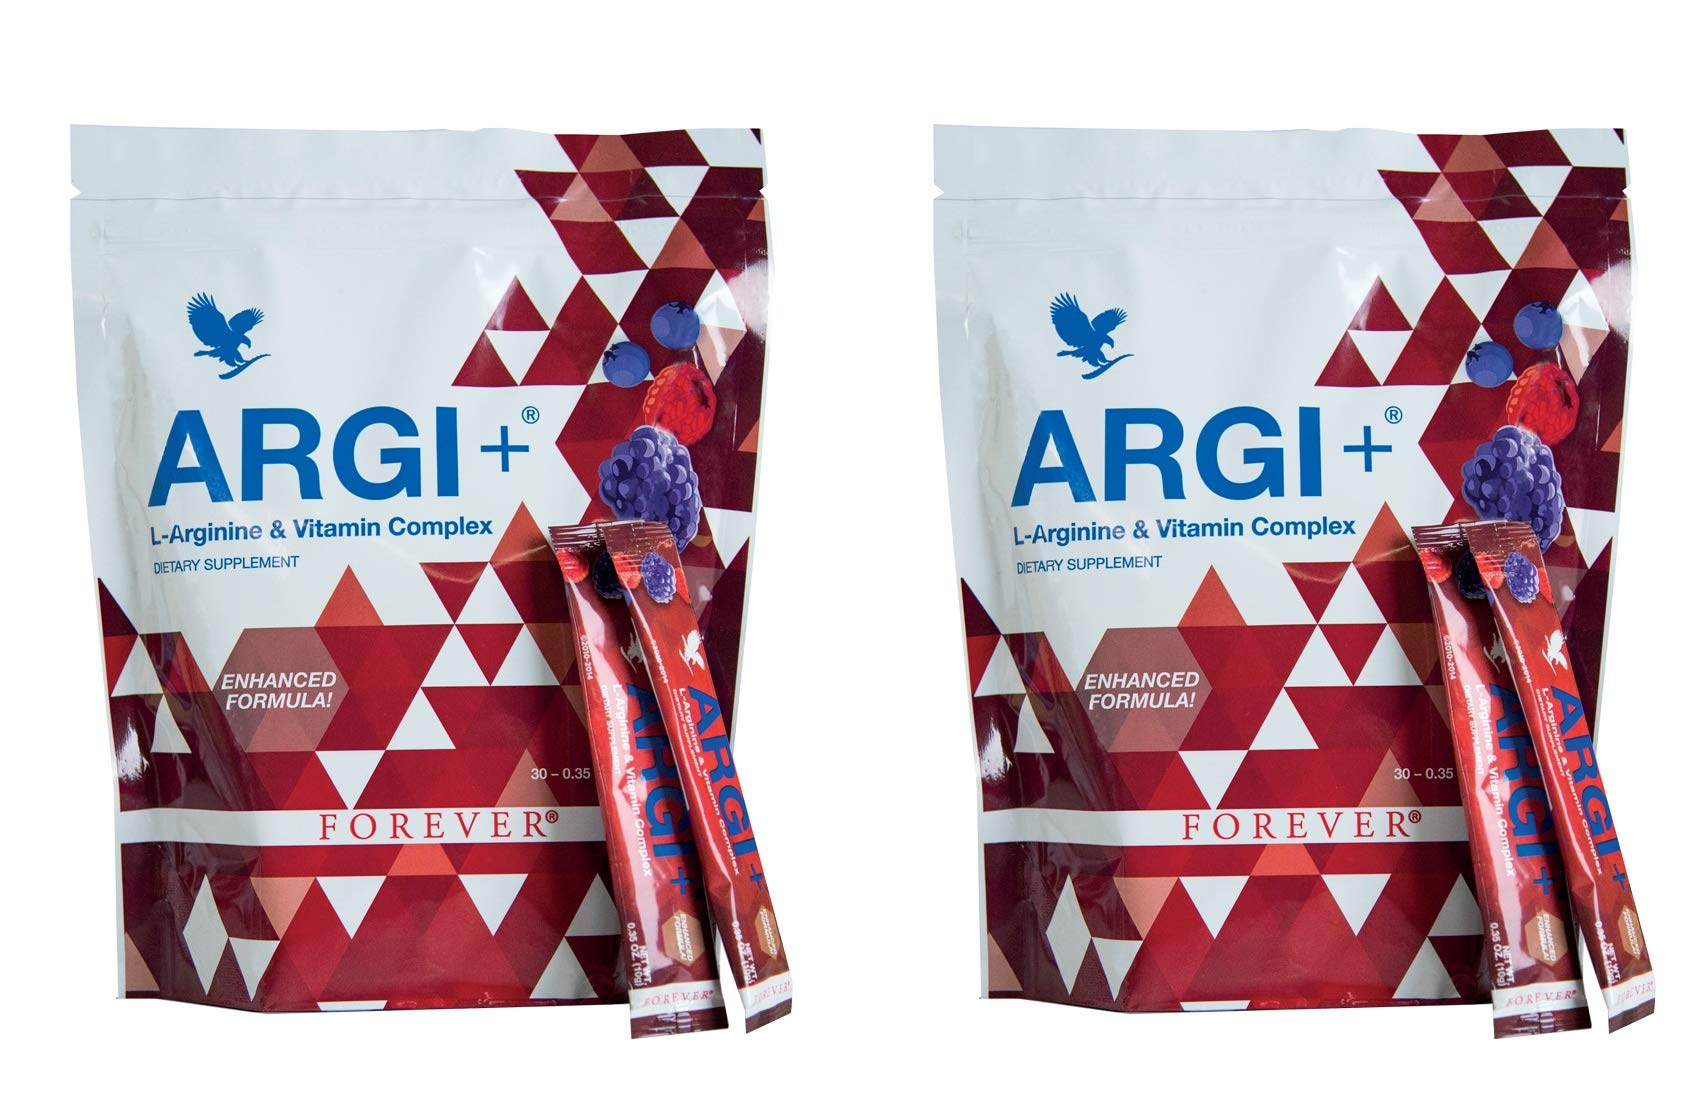 Forever Argi+ L-Arginine & Vitamin Complex, Pack of 2 by Forever Living